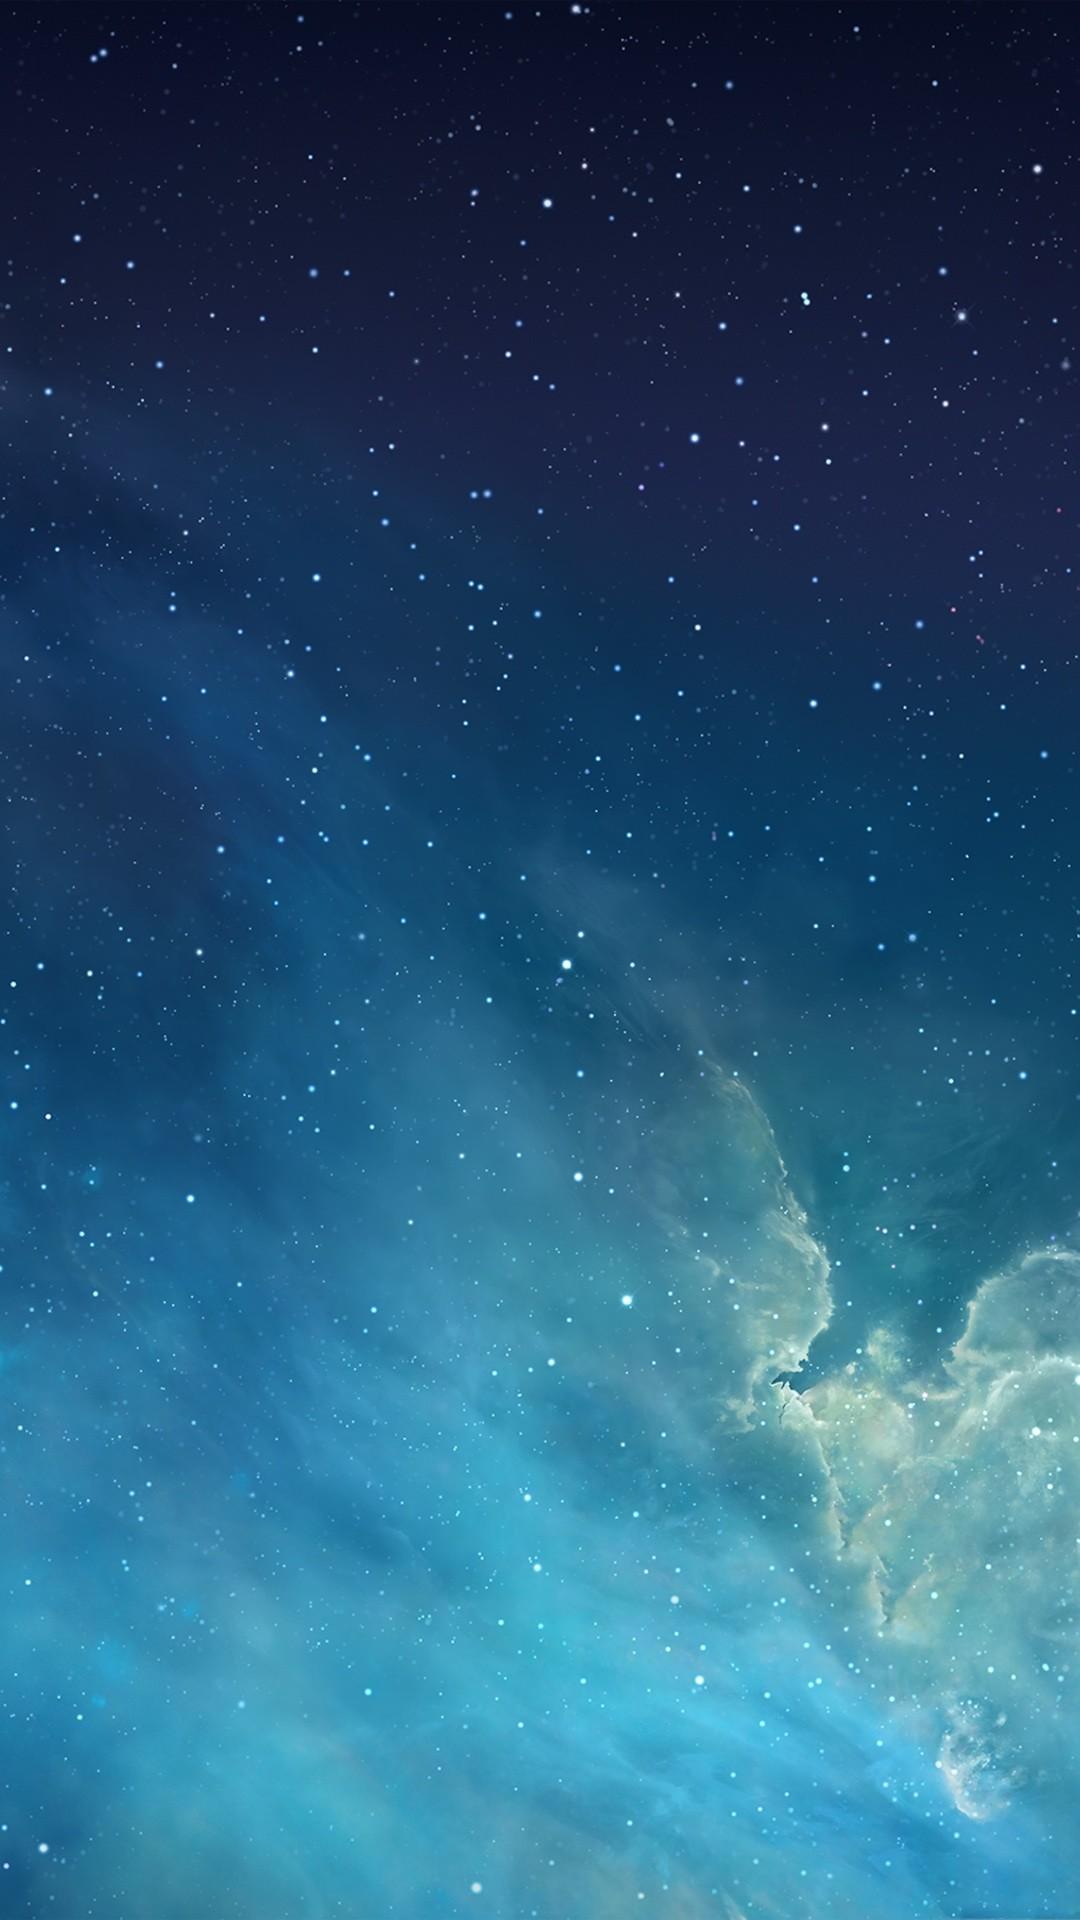 Res: 1080x1920, Apple iOS7 Default Lockscreen iPhone 6 Plus HD Wallpaper